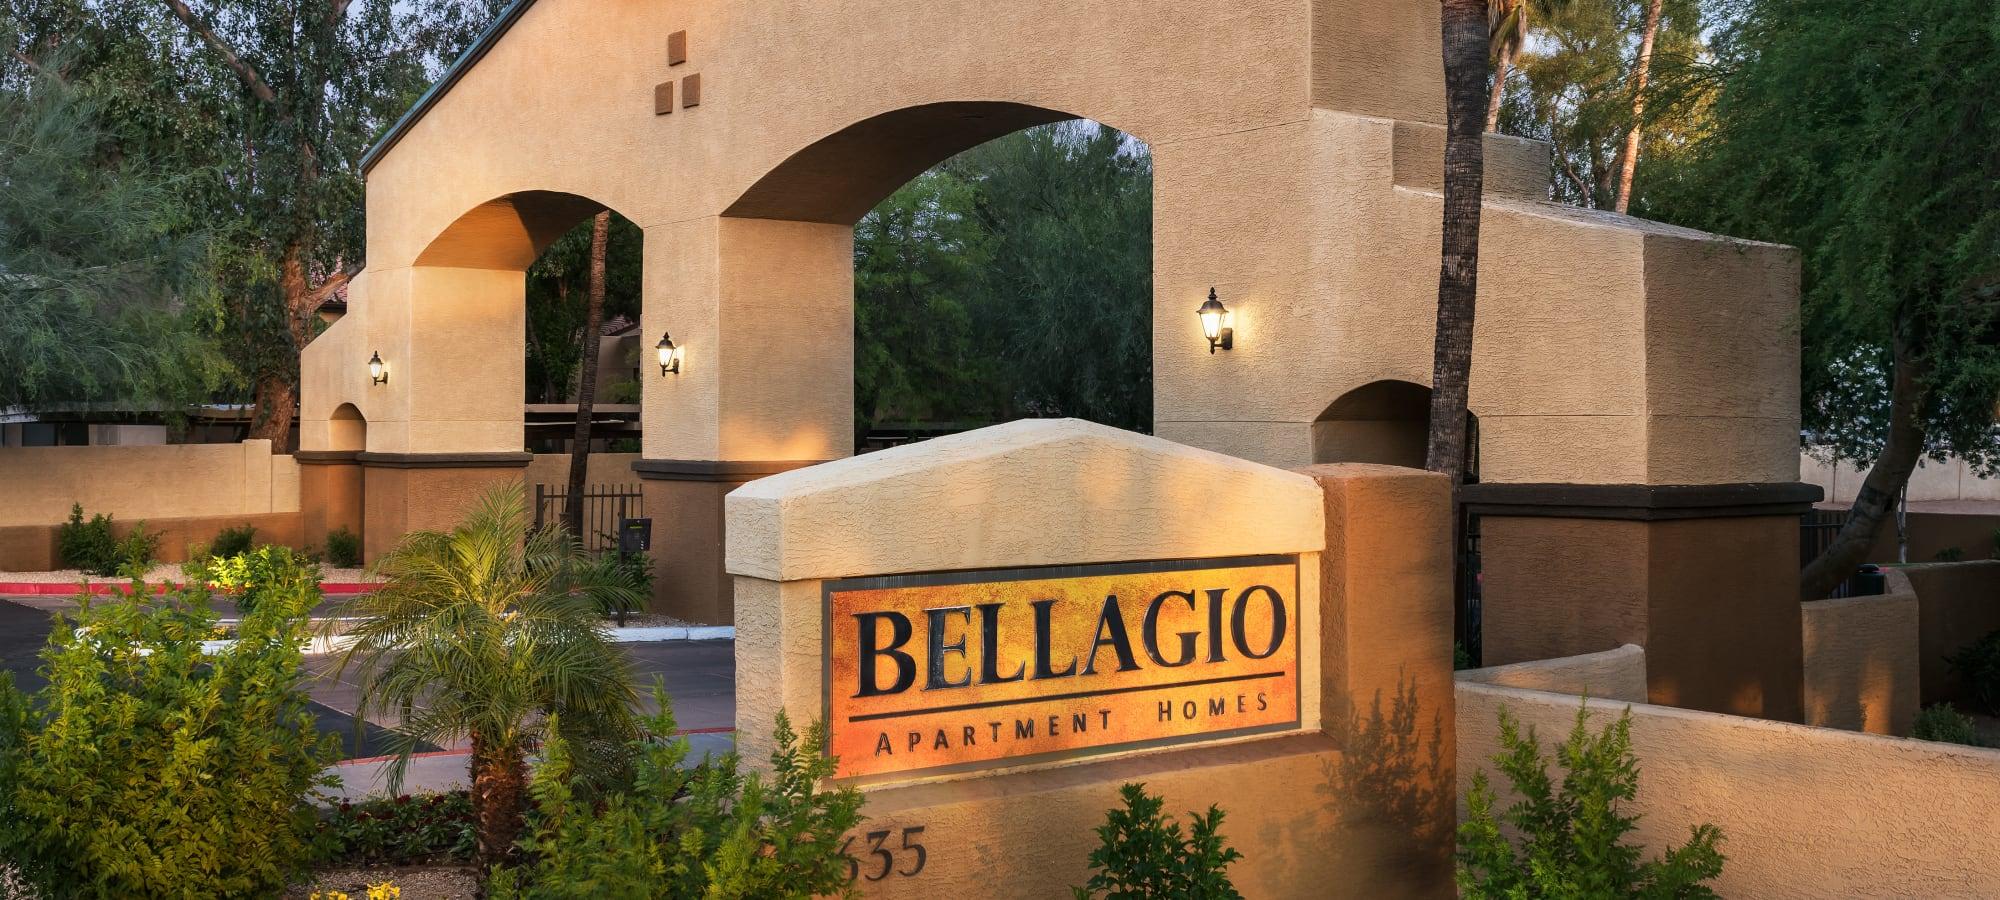 Entrance sign at Bellagio in Scottsdale, Arizona